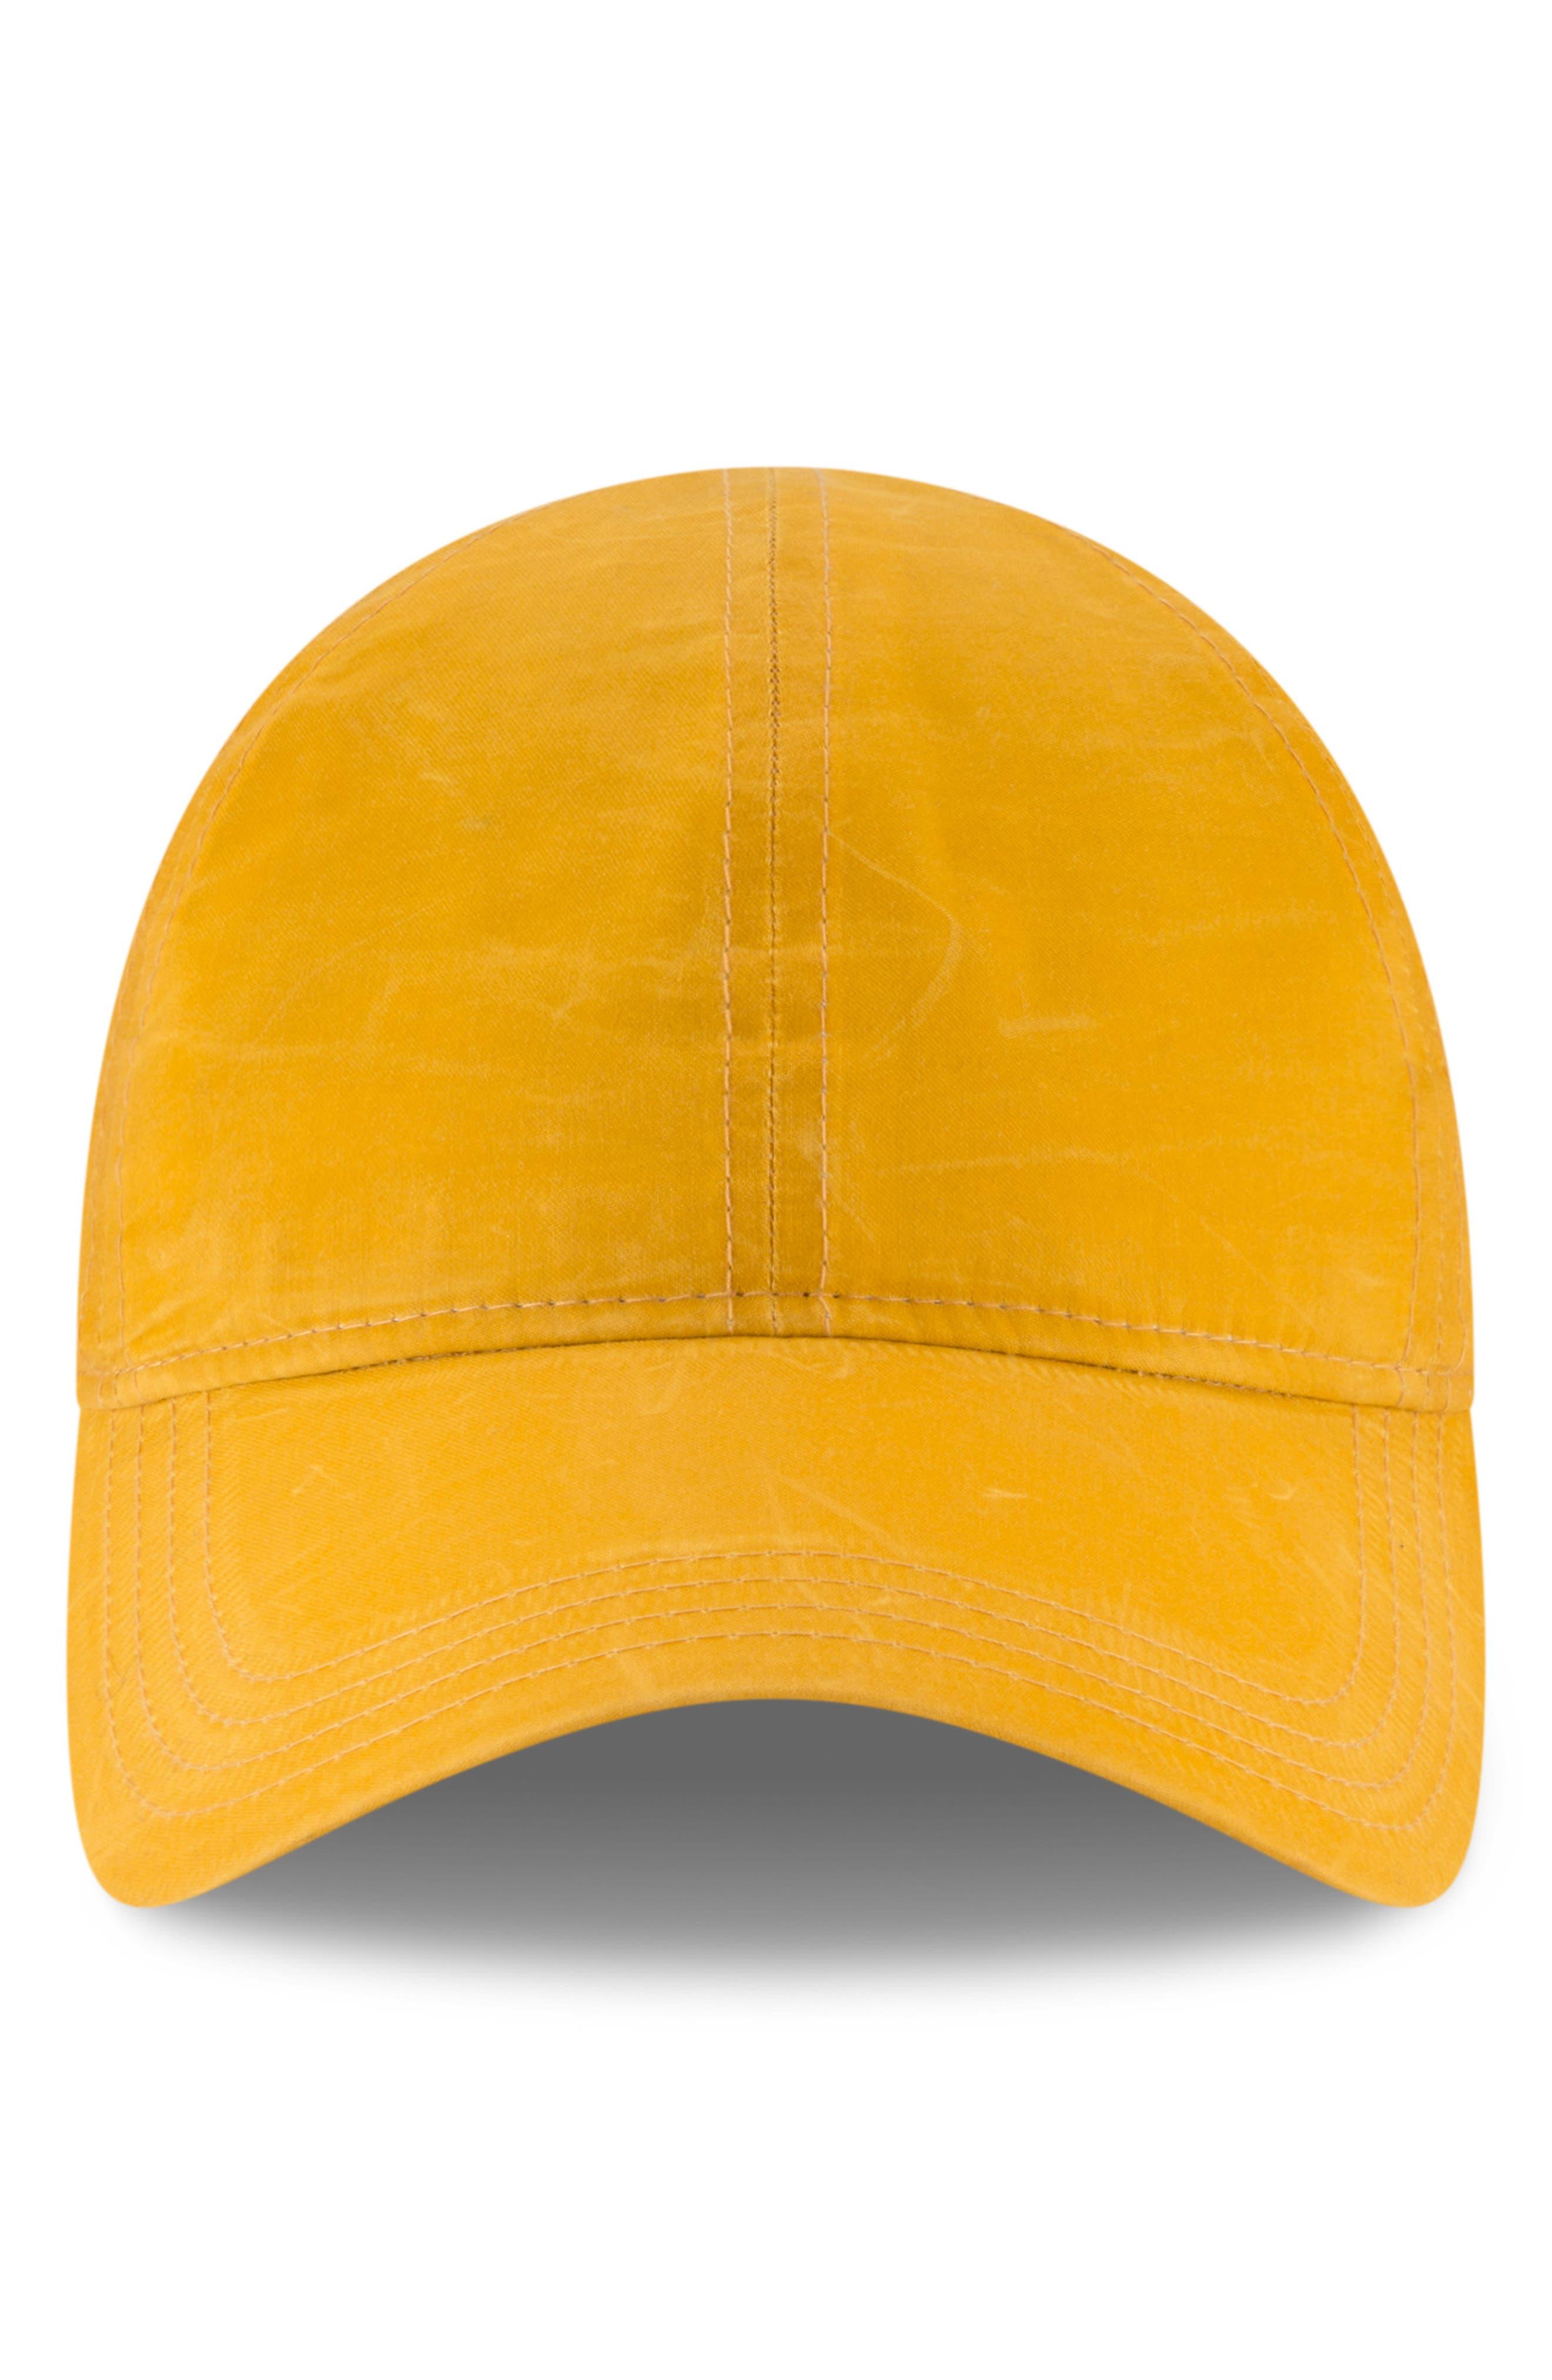 Moleskin 9Twenty Cap,                             Main thumbnail 1, color,                             GOLD